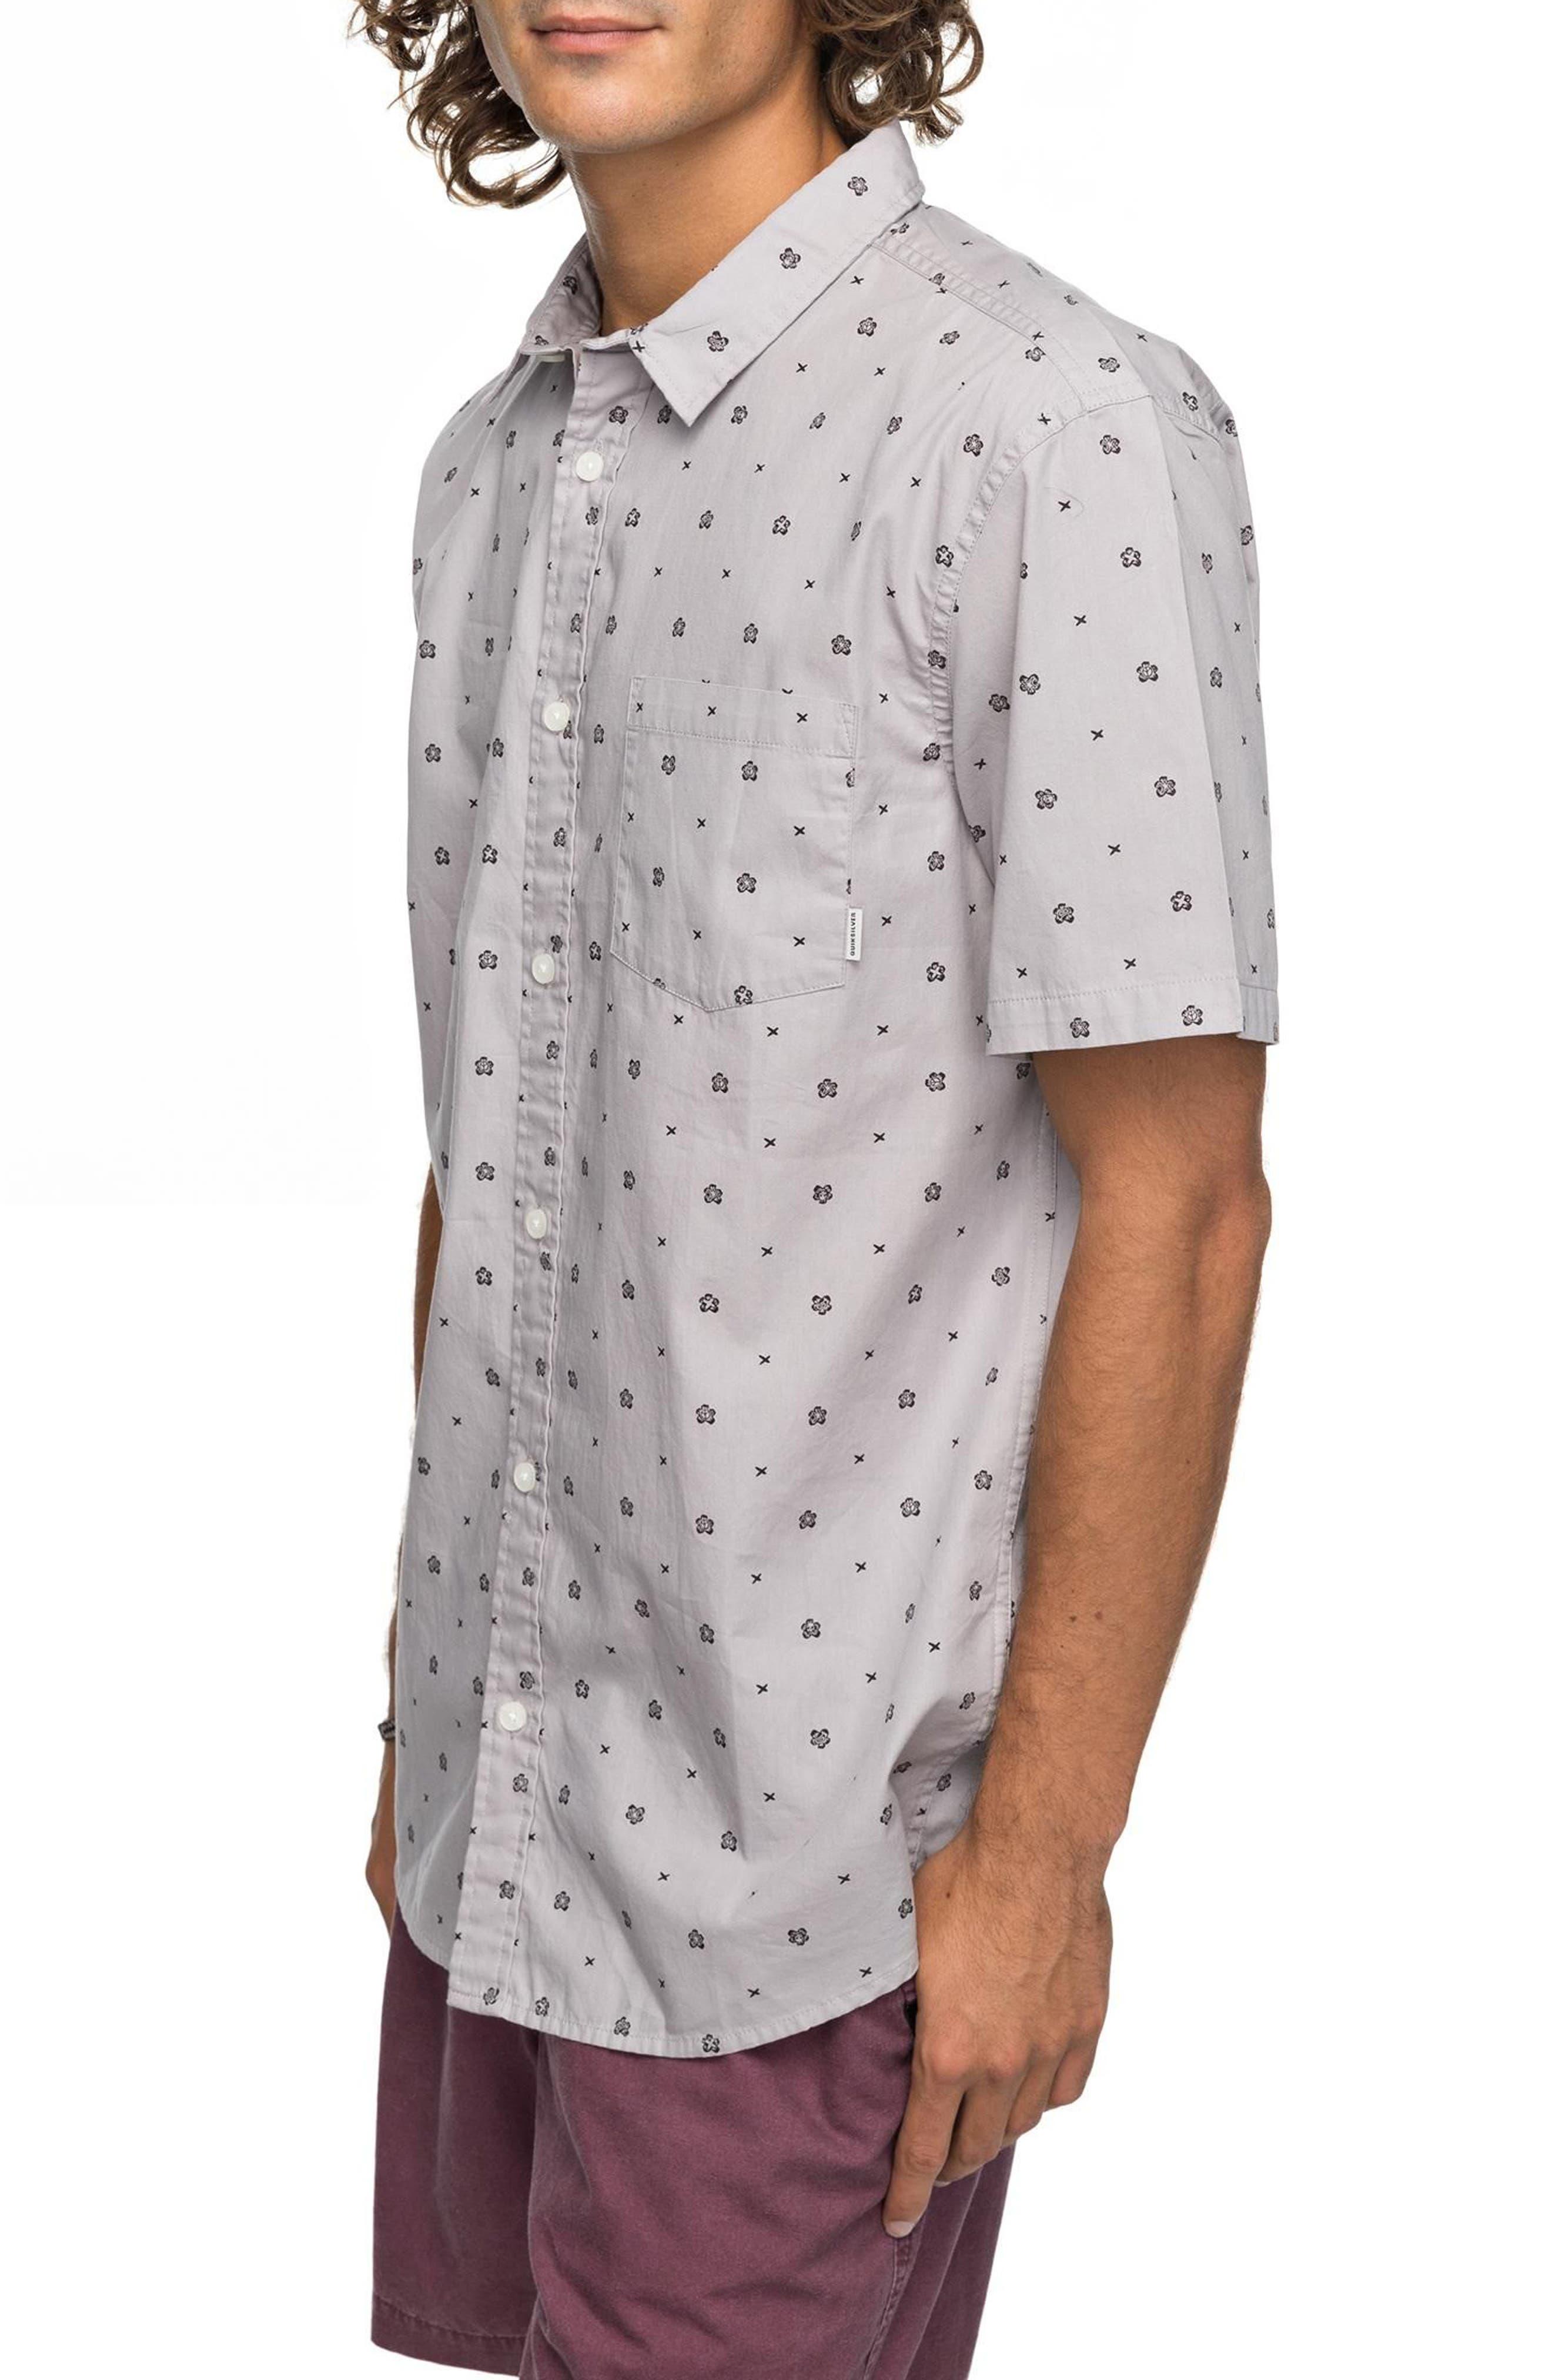 Kamanoa Short Sleeve Shirt,                         Main,                         color, Silver Sconce